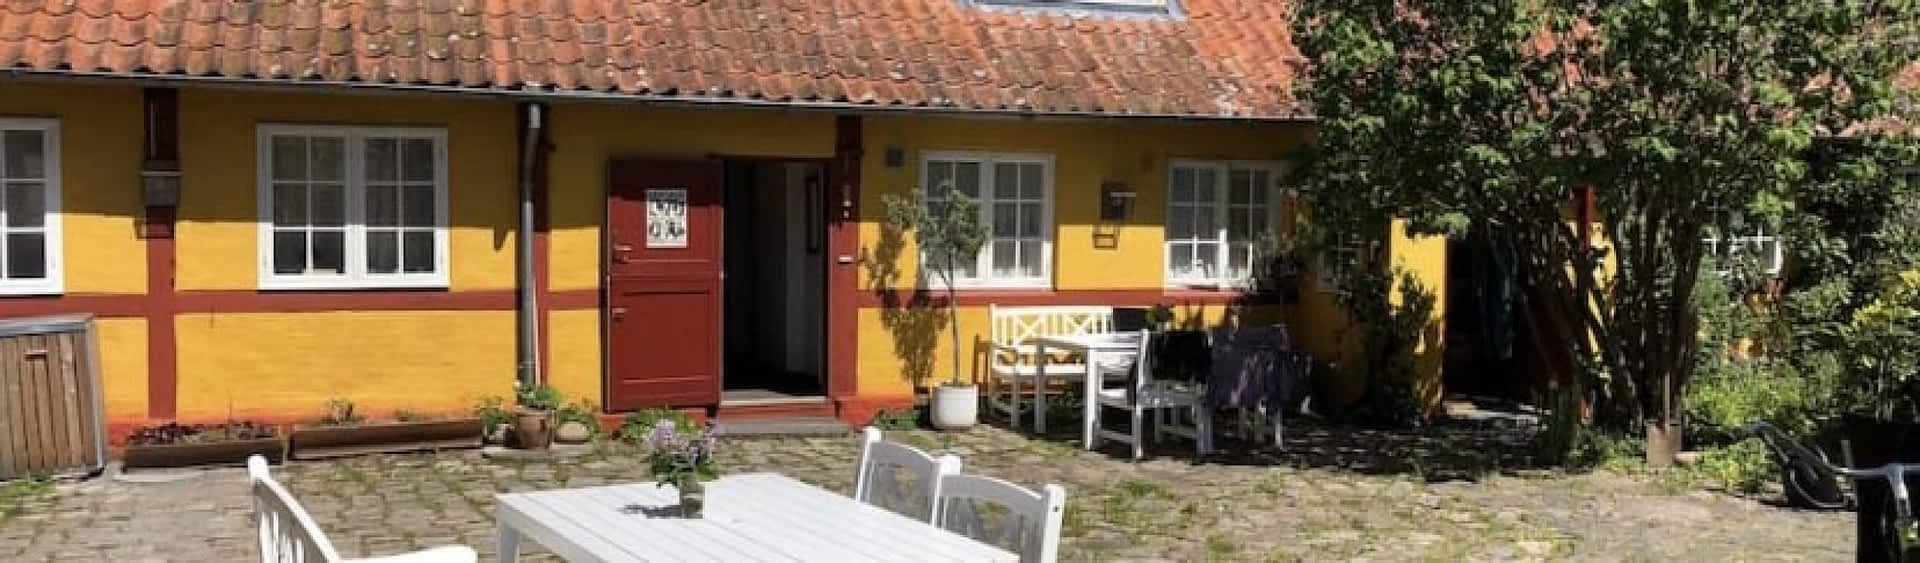 psykolog-bornholm-svaneke-vestergade-psykologen-nina-dam